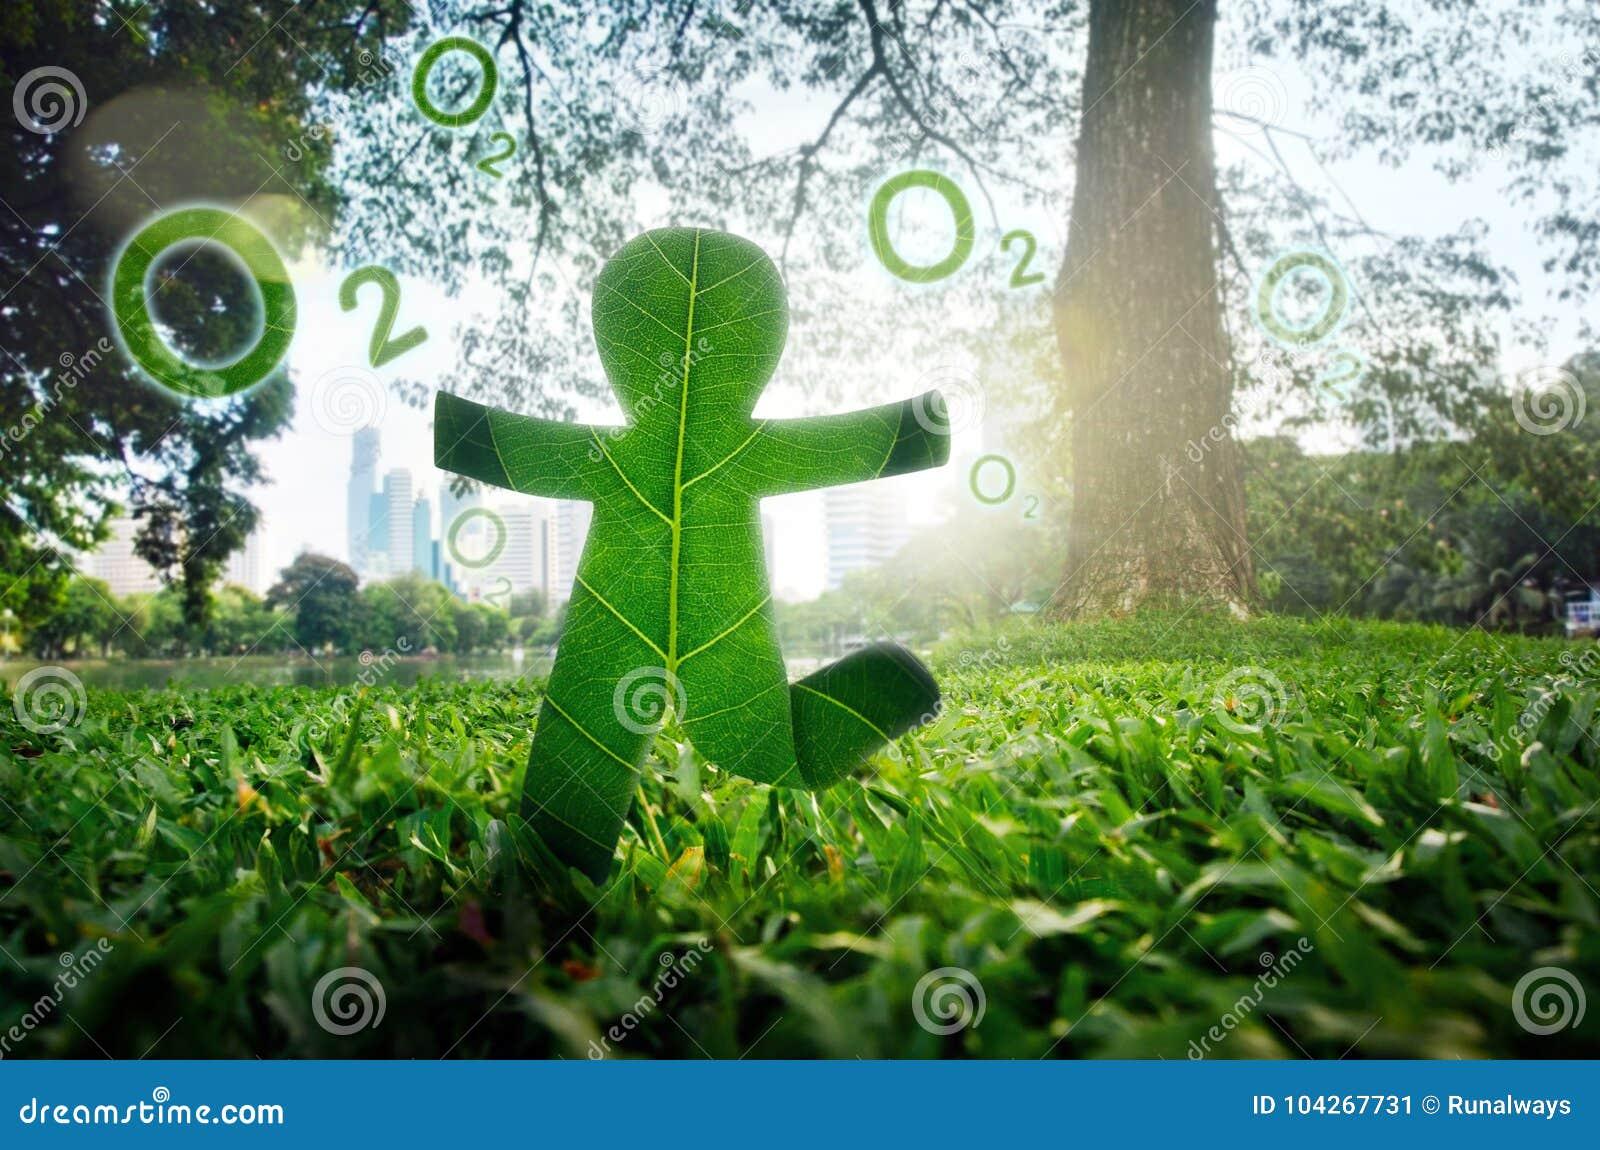 Environment to fresh air concept.